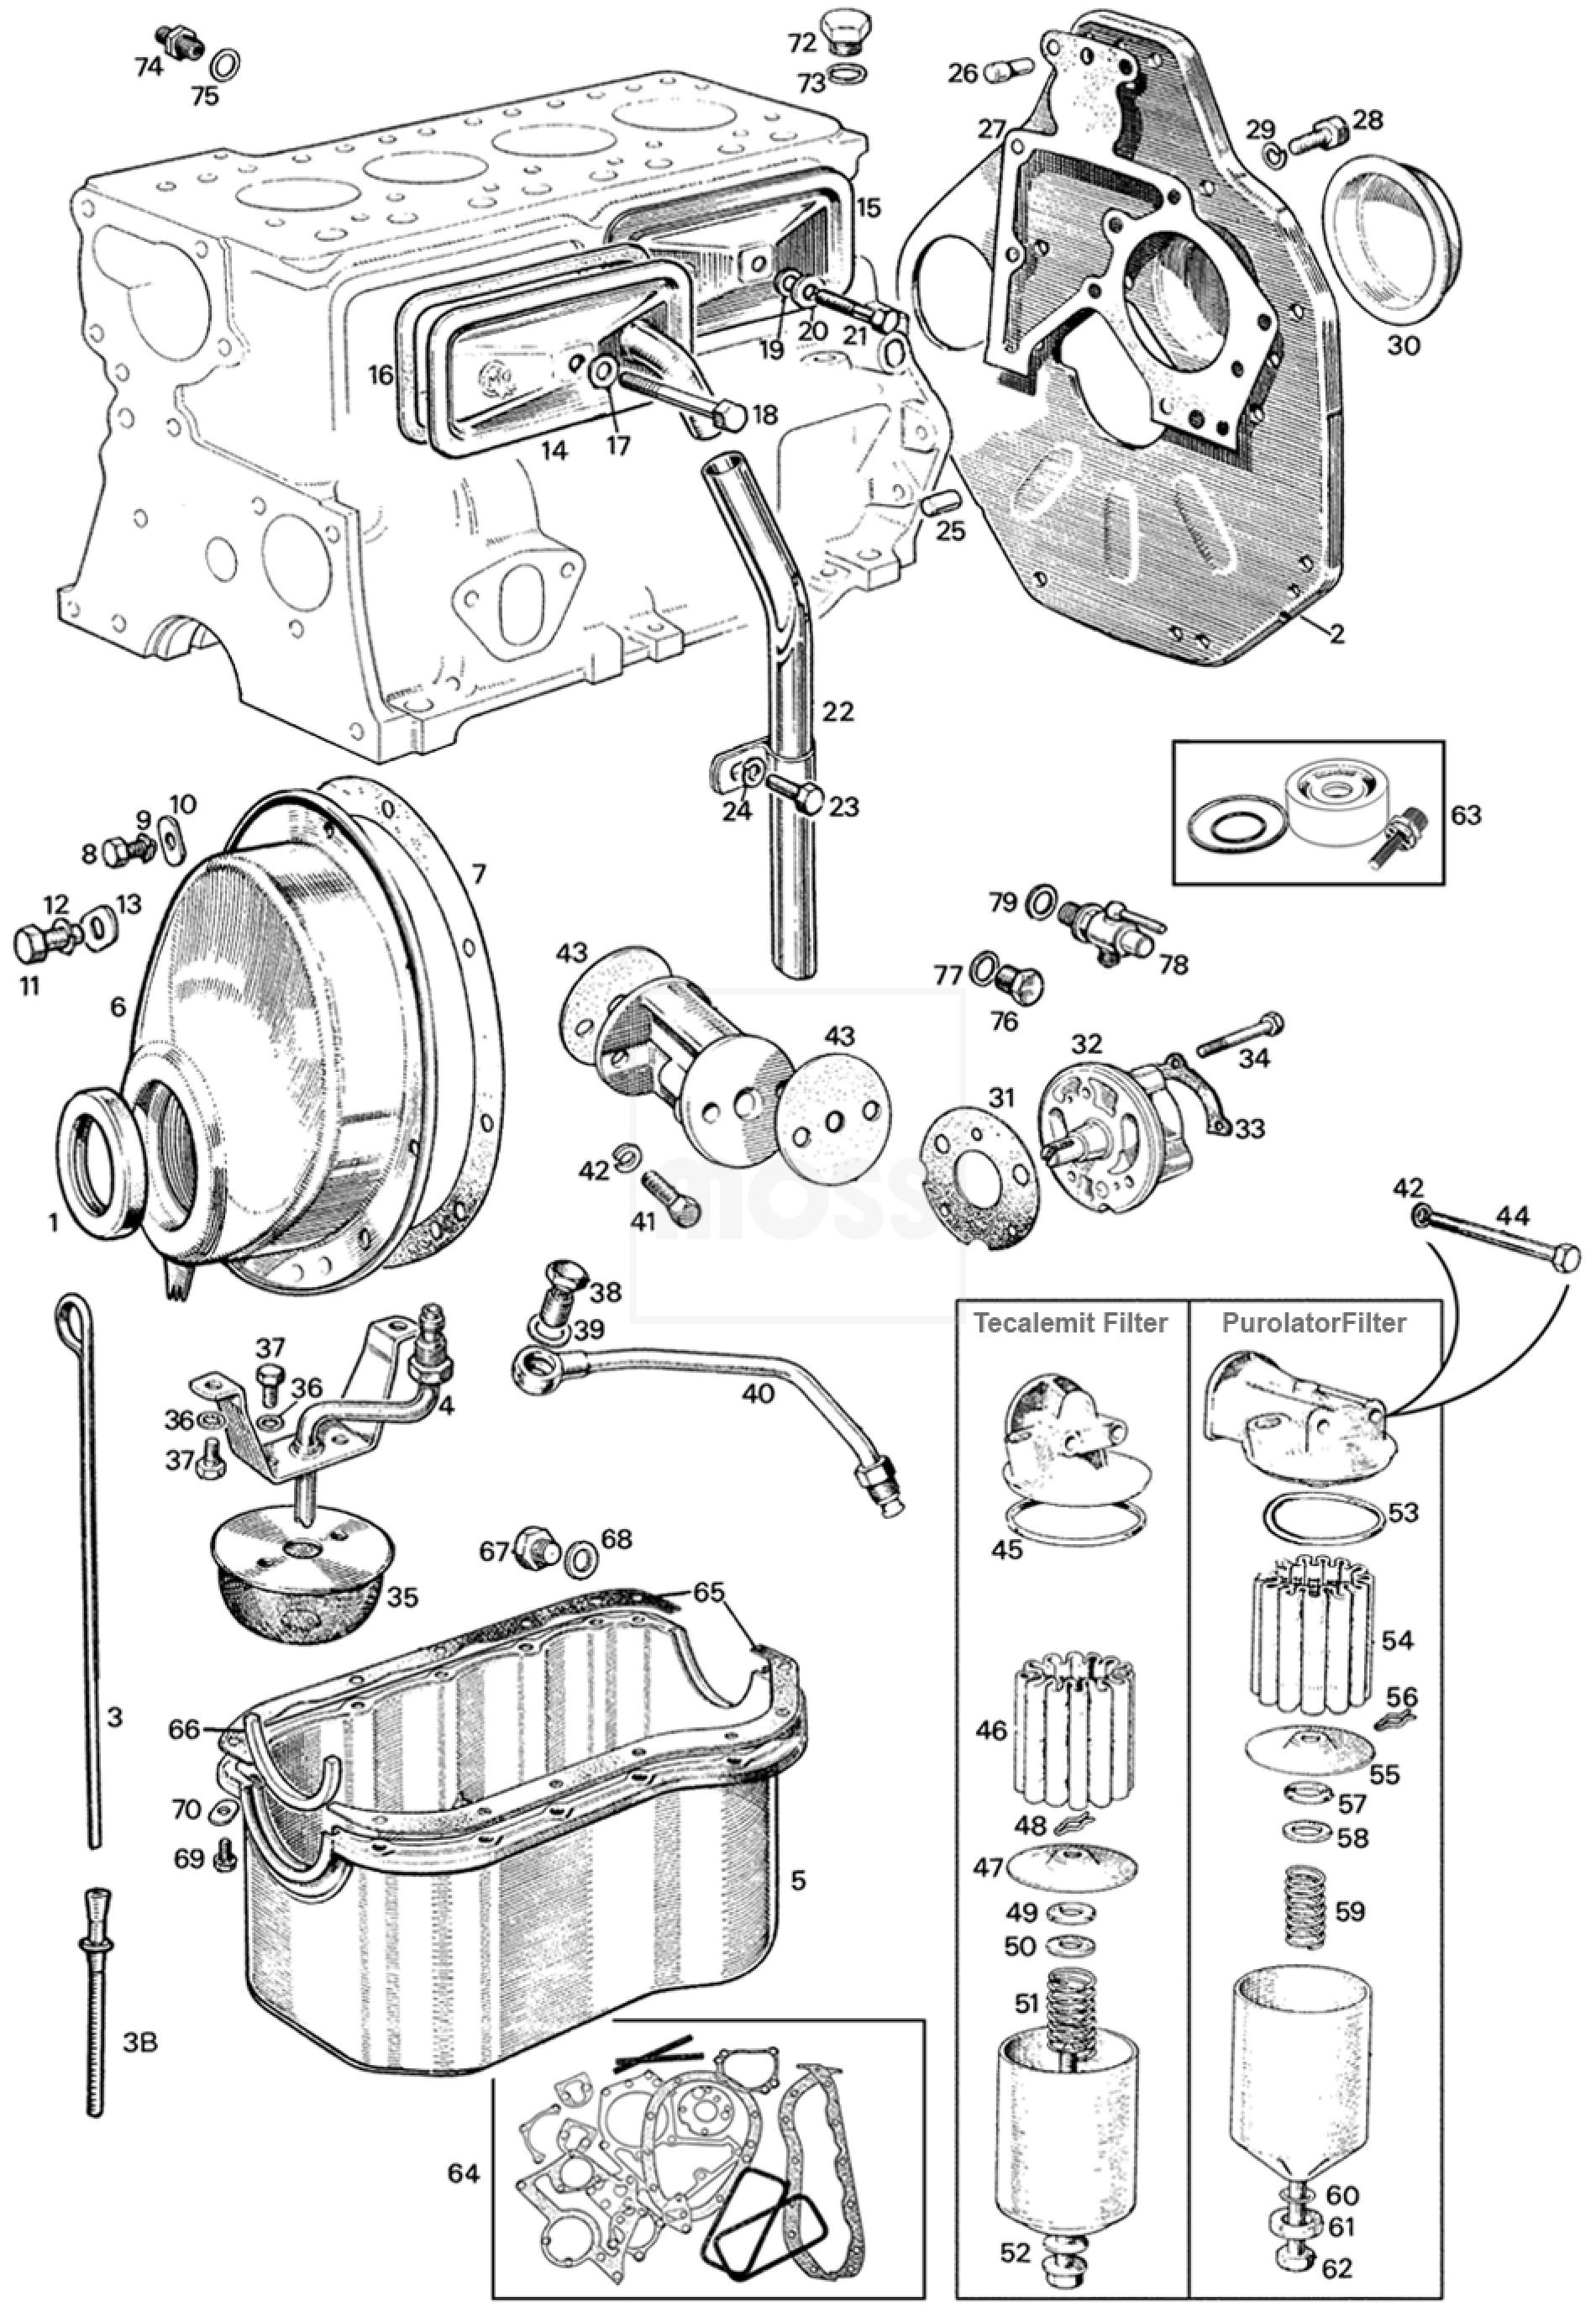 1979 mg midget engine diagram-3459